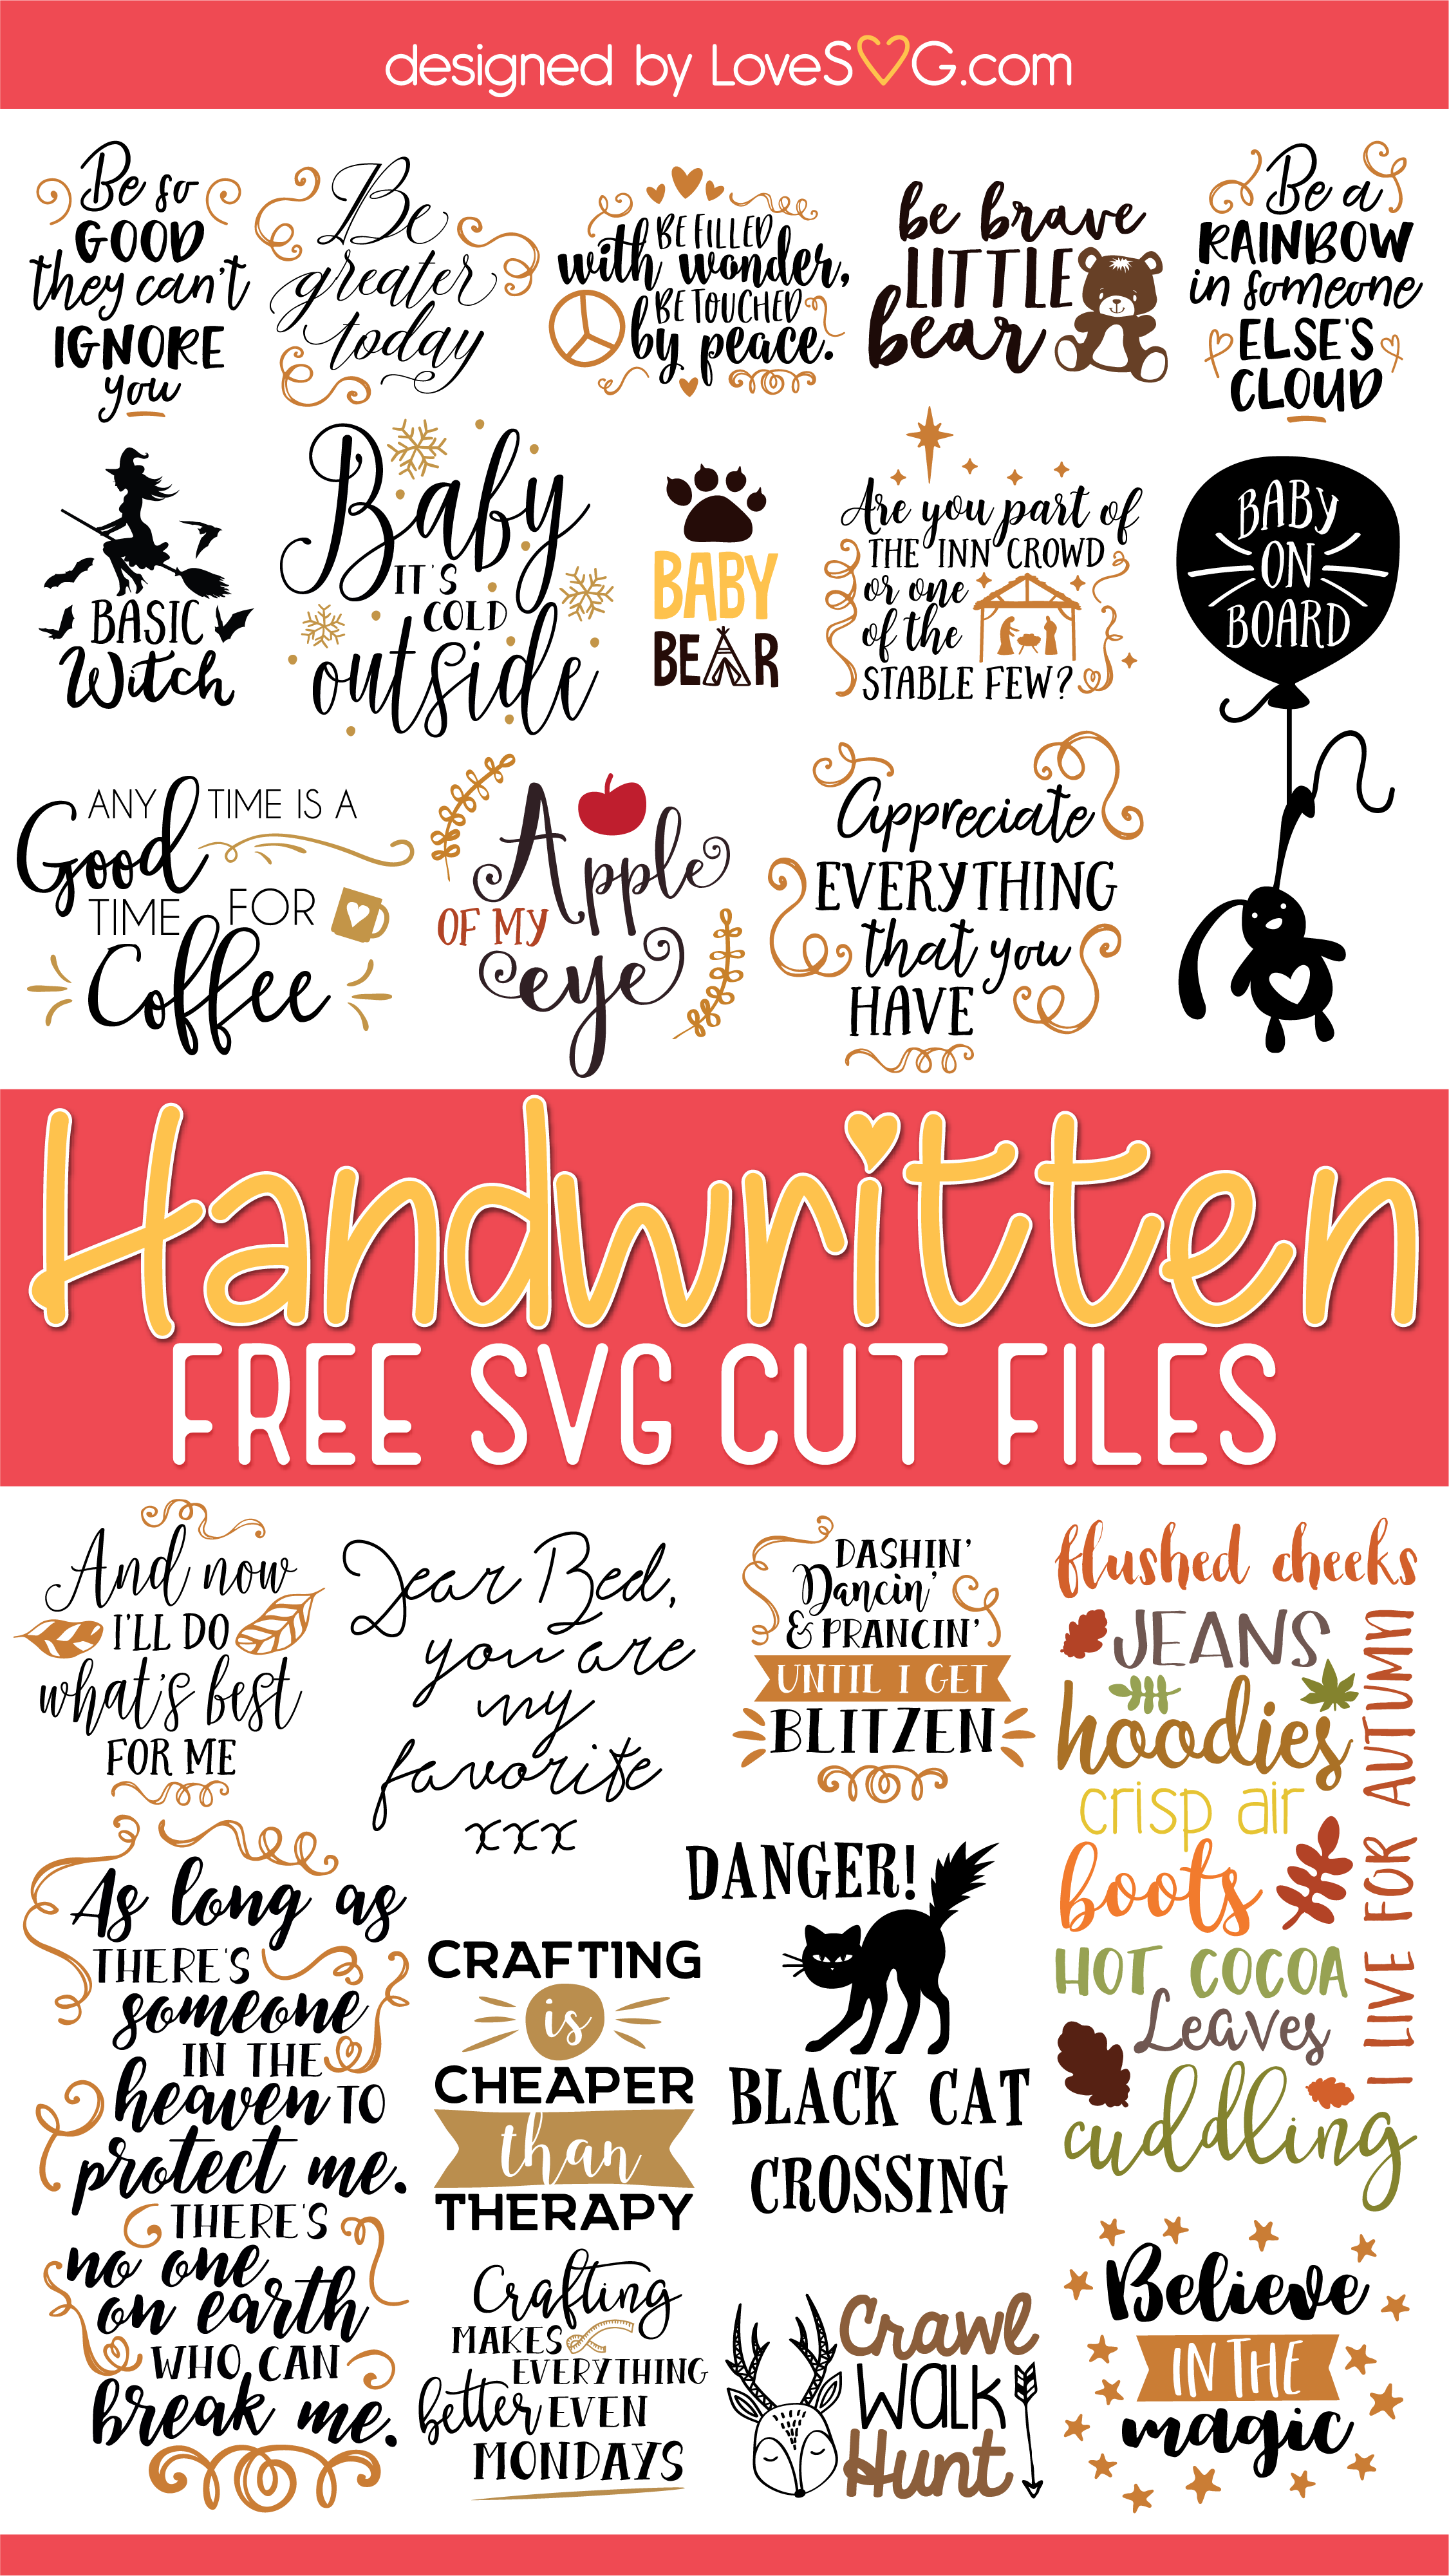 Free Handwritten SVG Cut Files | LoveSVG.com